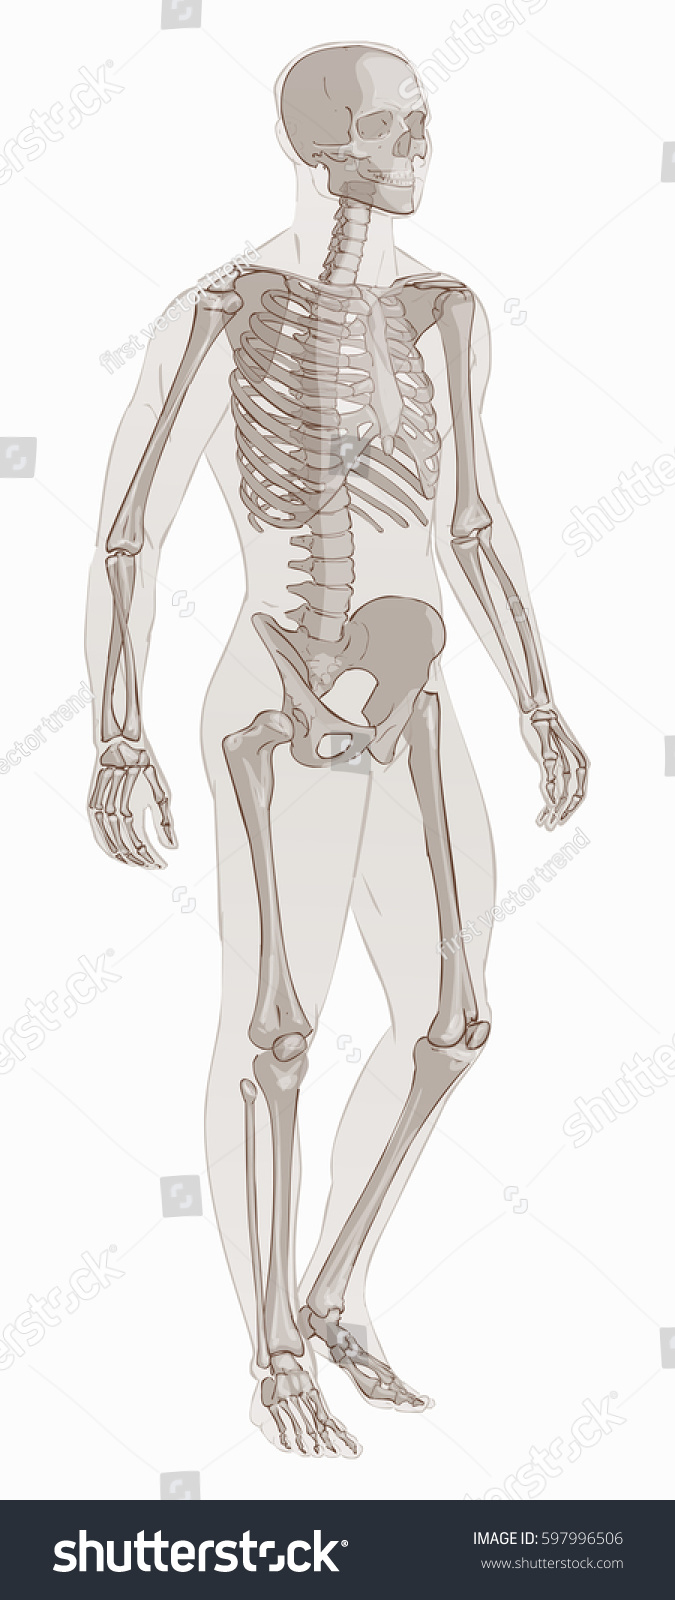 Human Body Parts Man Skeletal Anatomy Stock Vector (Royalty Free ...